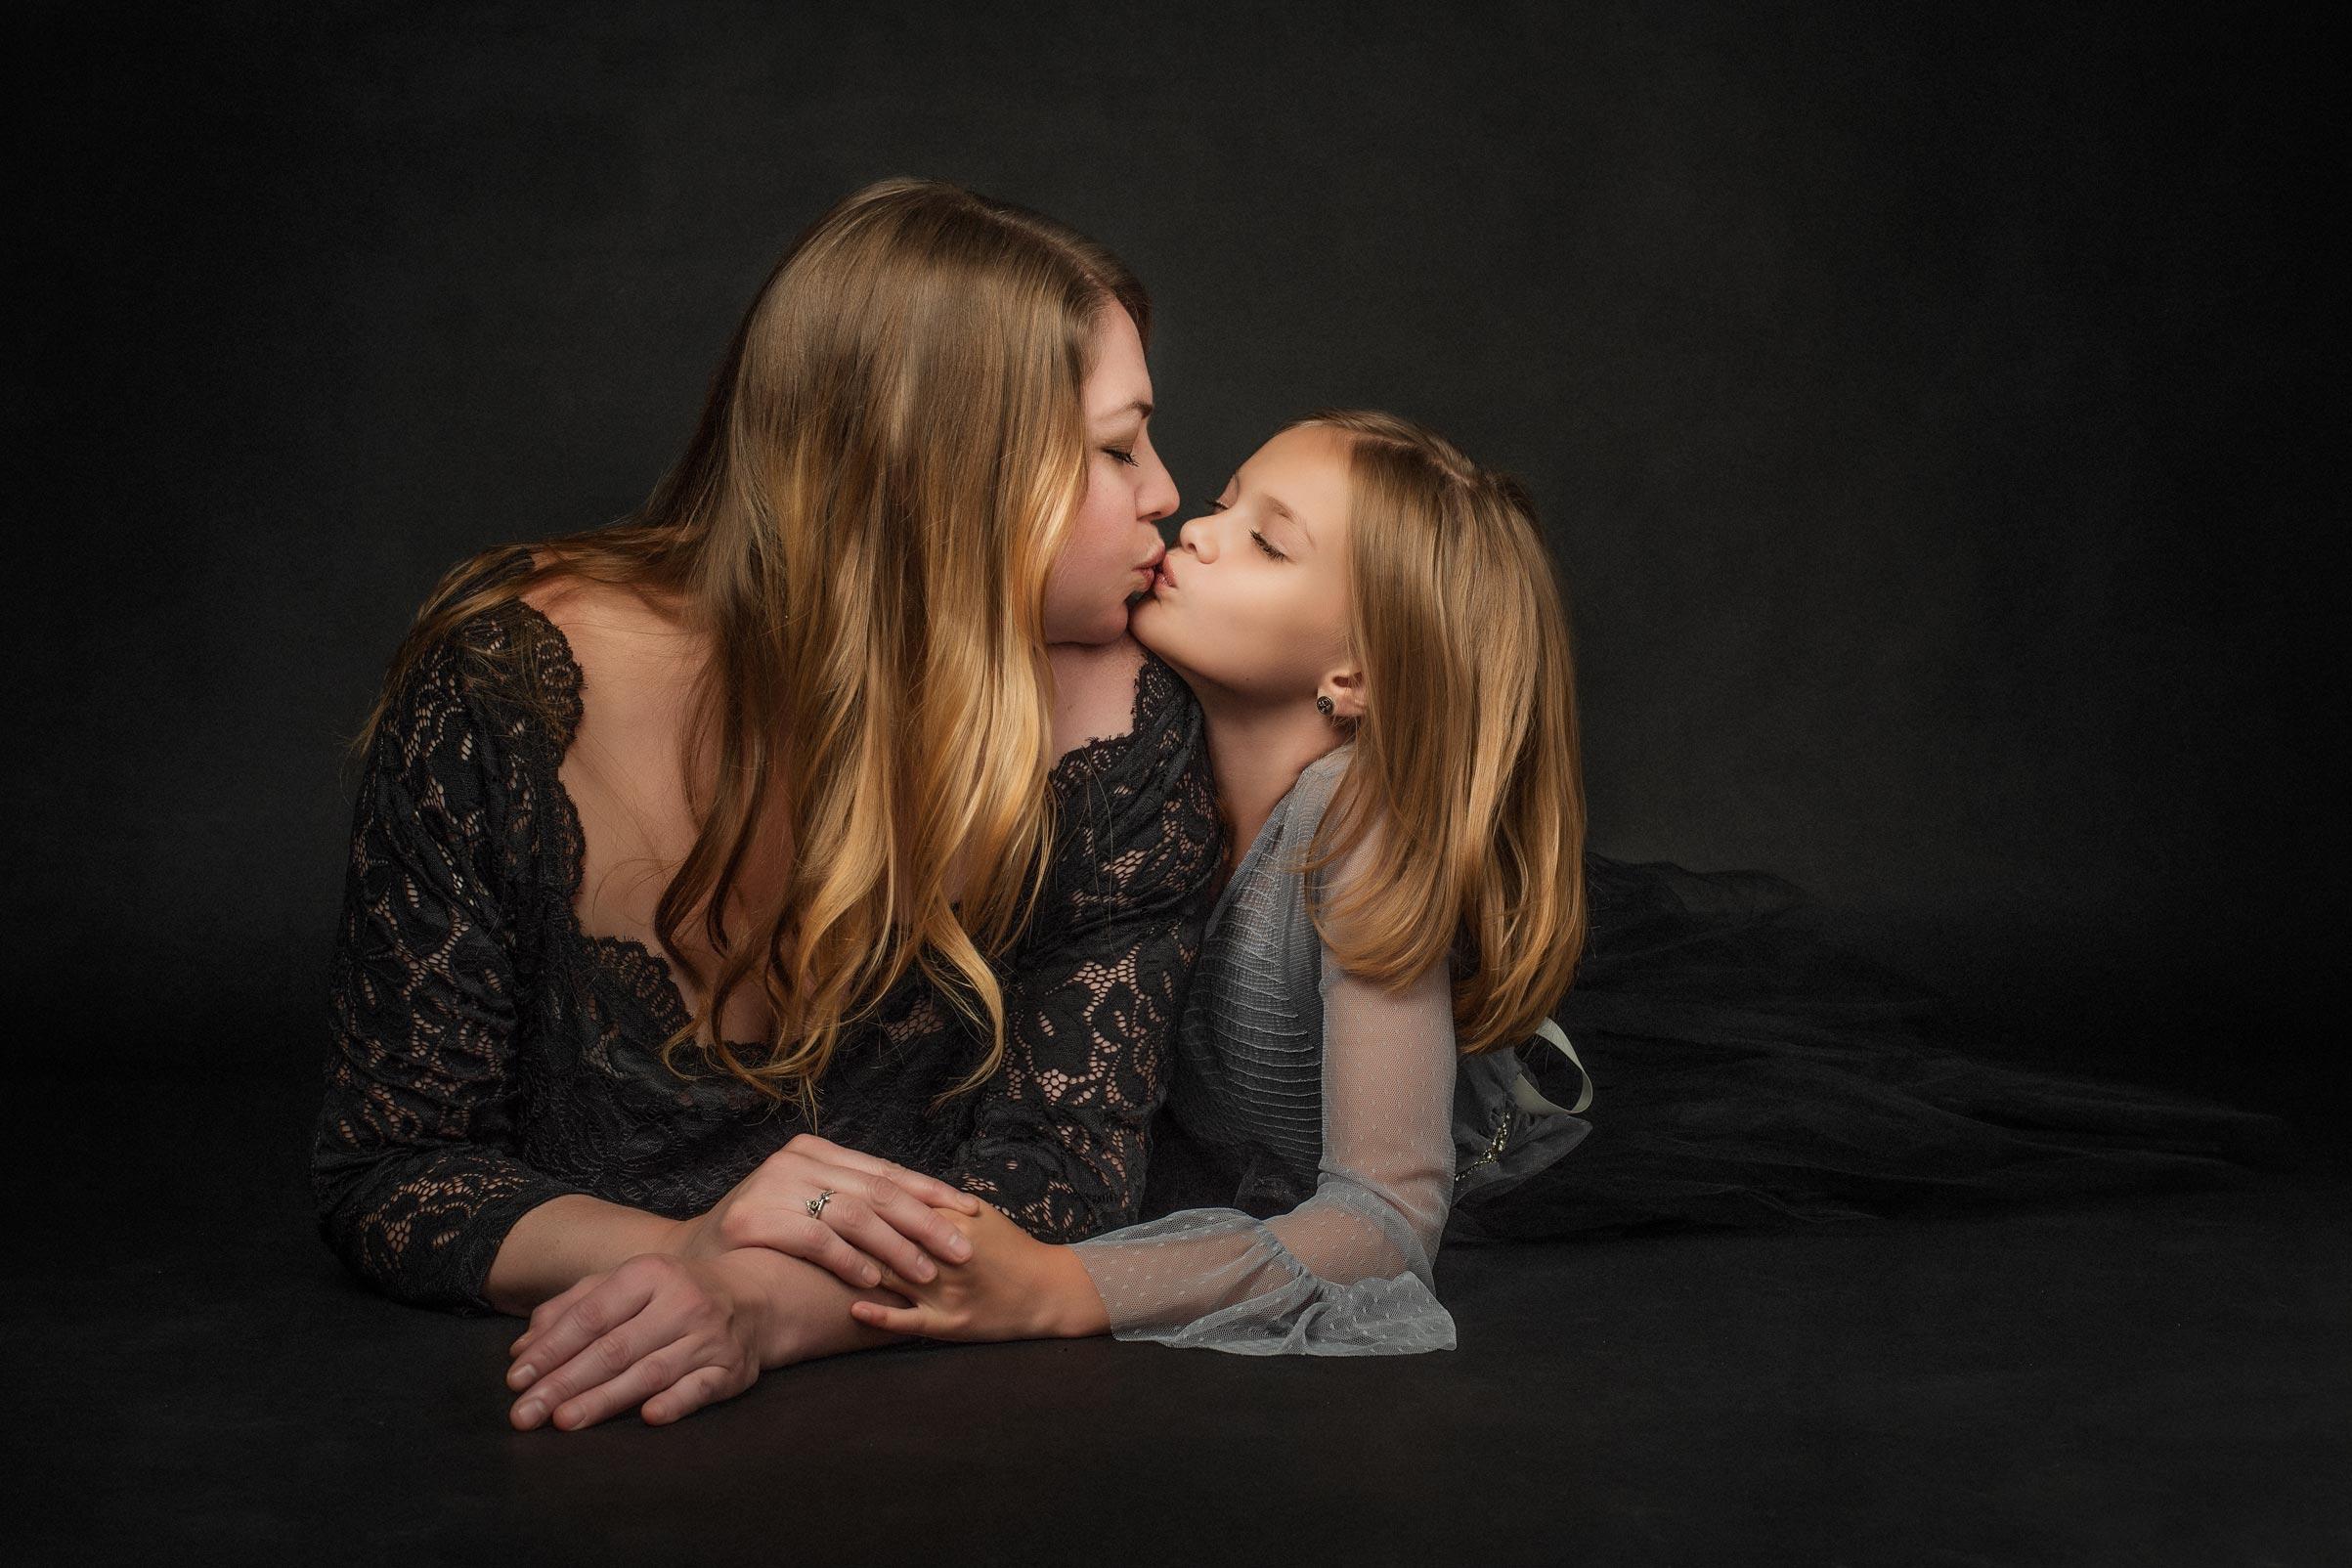 barbara_macferrin_photography_boulder_colorado_80303_fine_art_family_mother_daughter_kiss.jpg